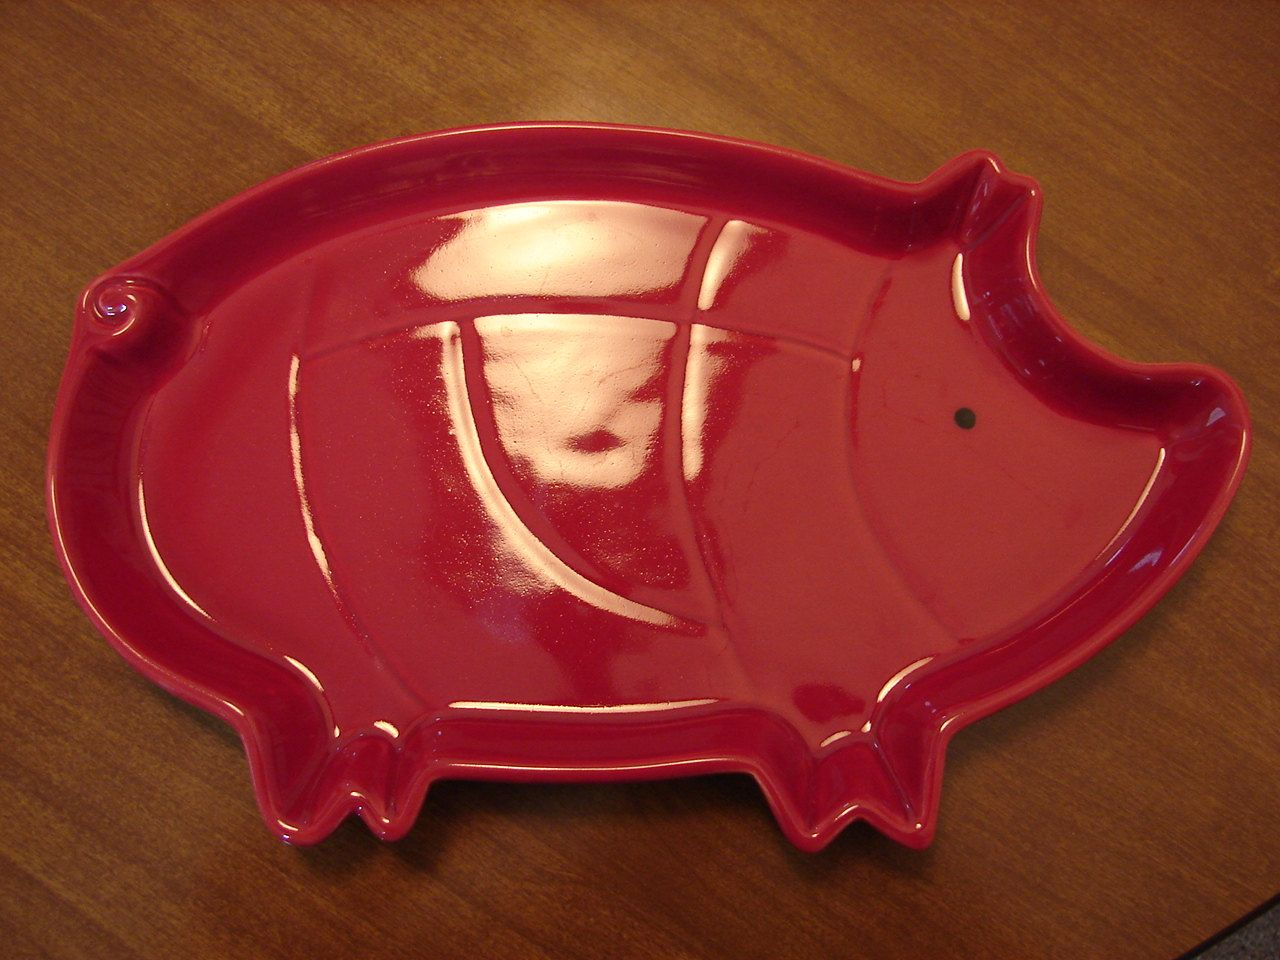 Vintage Red Pig Tray Plate Shaped Like A Pork Cut